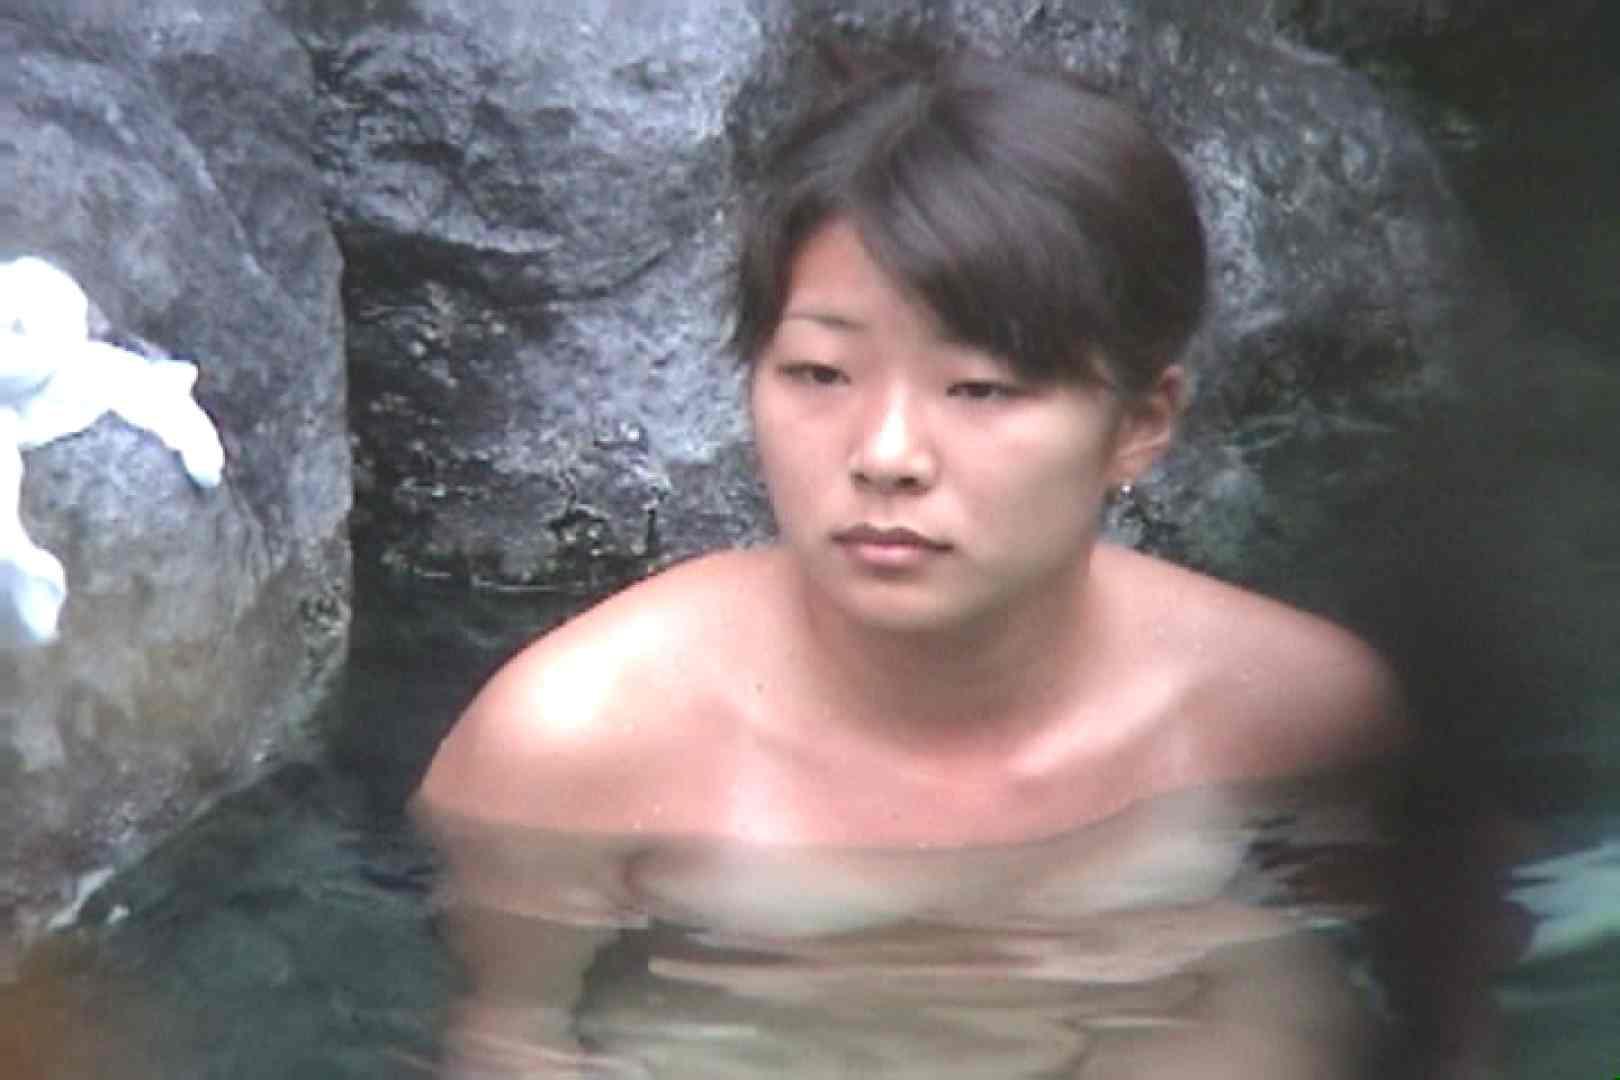 Aquaな露天風呂Vol.69【VIP限定】 OLのエロ生活   露天風呂  106連発 88